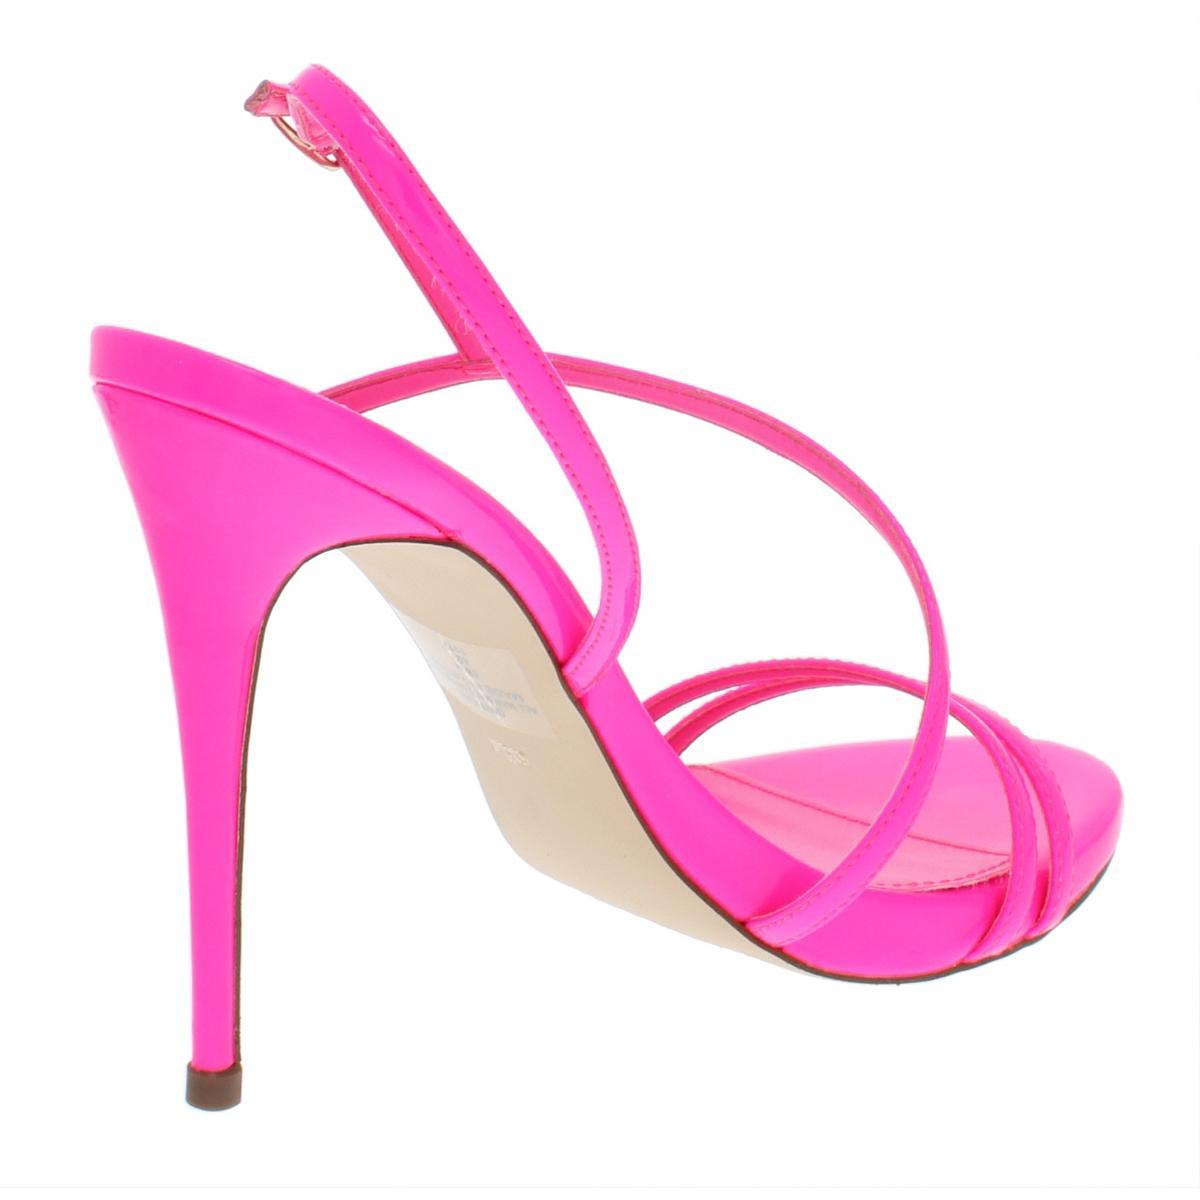 Guess Womens Tilda Strappy Stiletto Open Toe Dress Dress Dress Sandals shoes BHFO 6195 0d946b